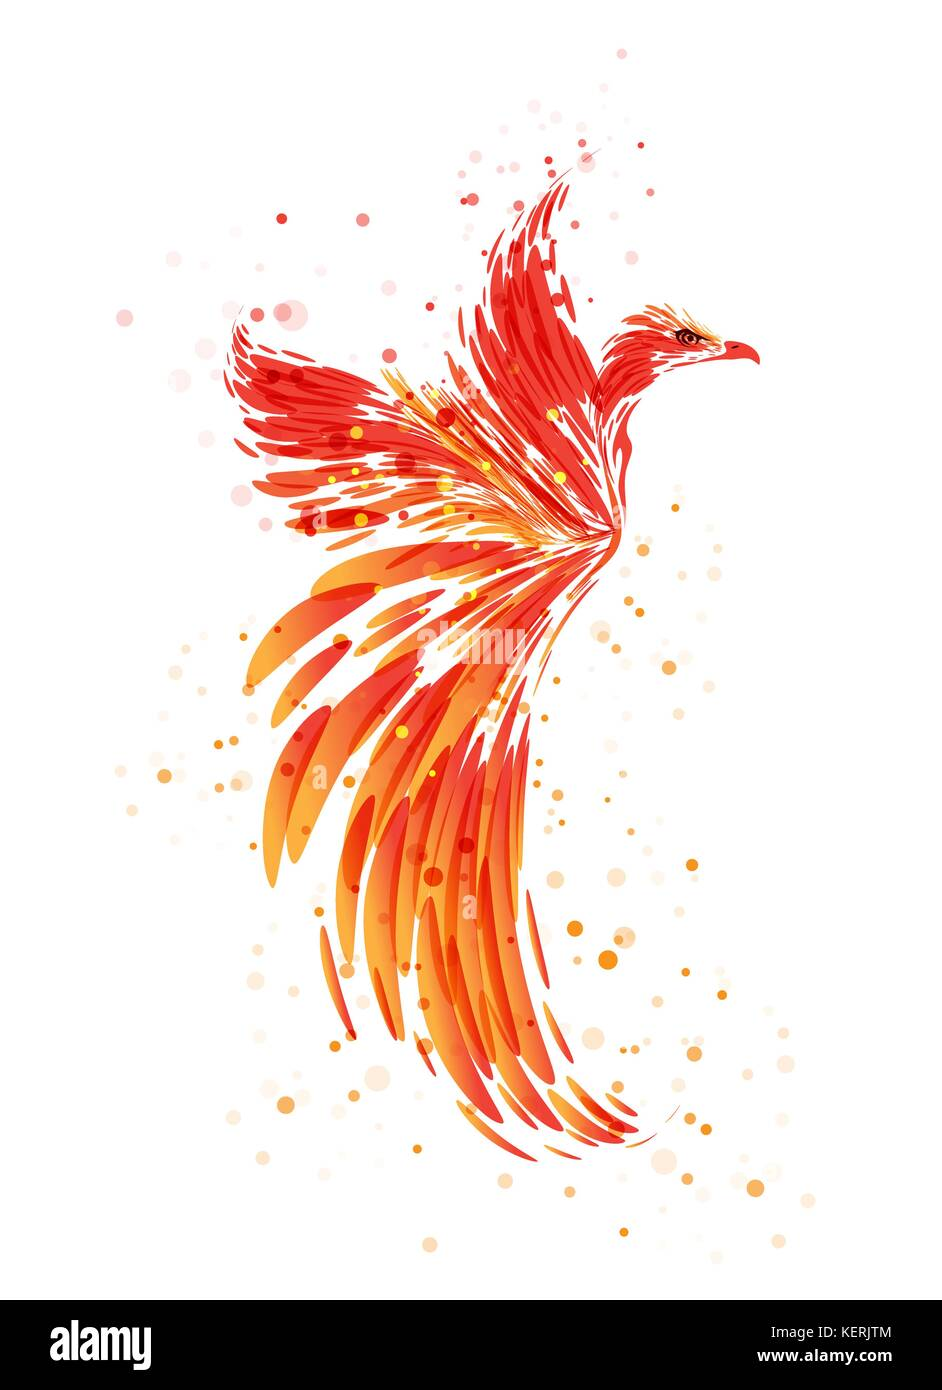 Phoenix Bird Stock Photos & Phoenix Bird Stock Images